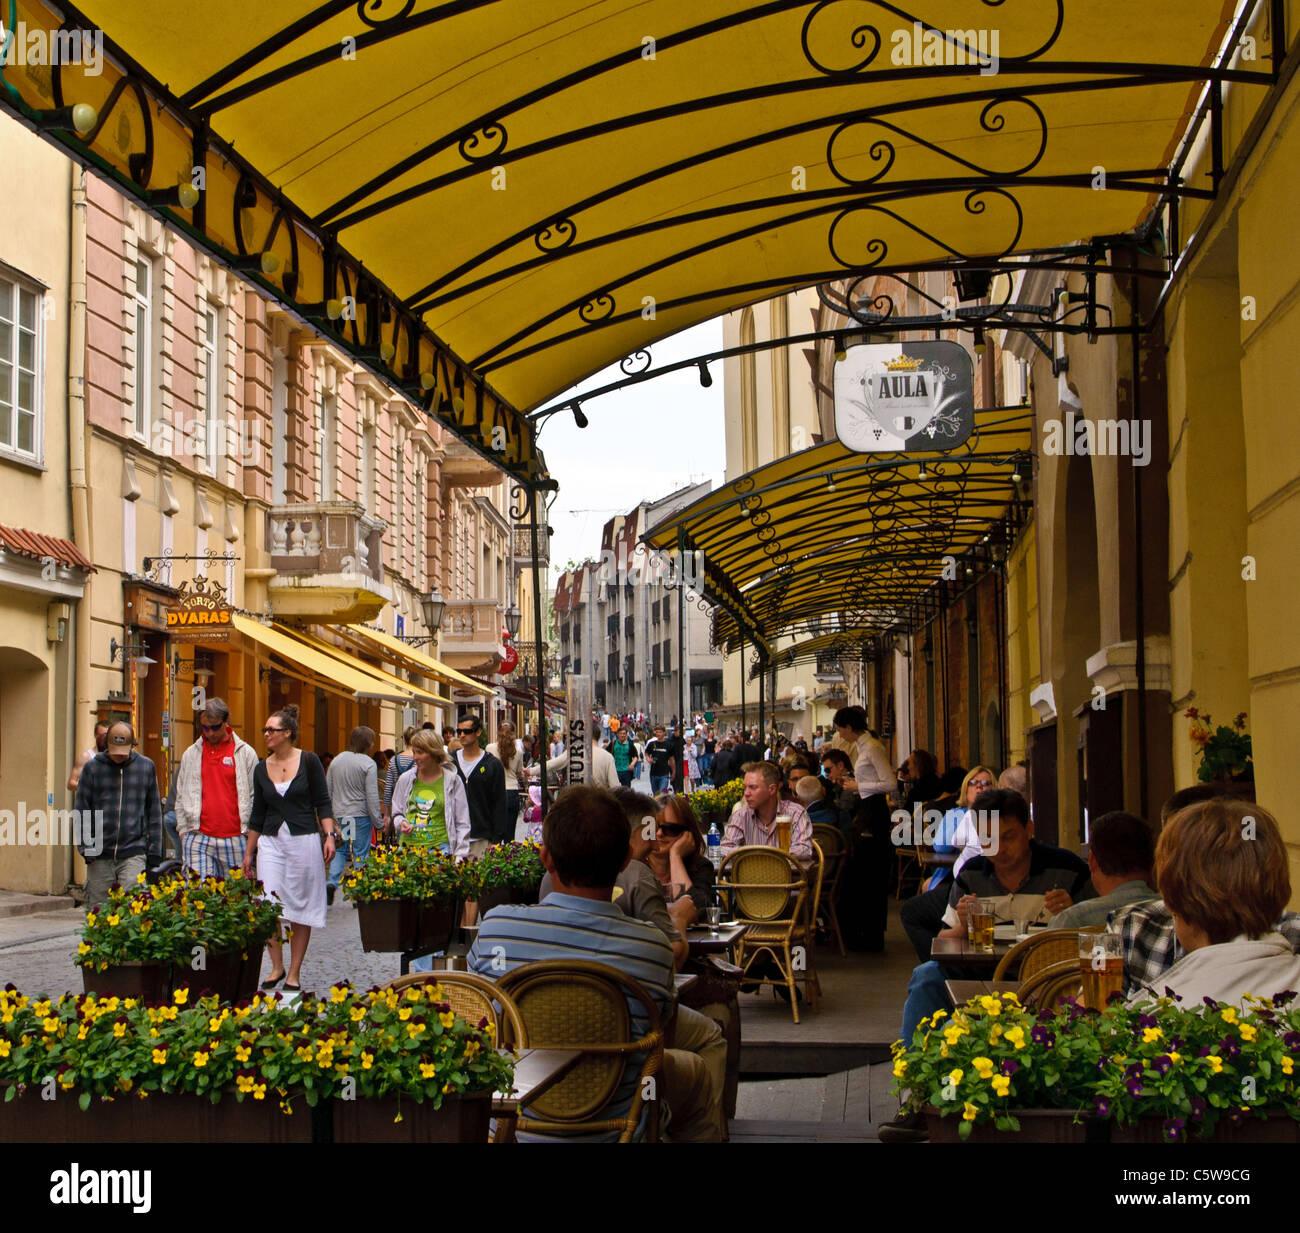 Pilies street - Vilnius, Lithuania - Stock Image